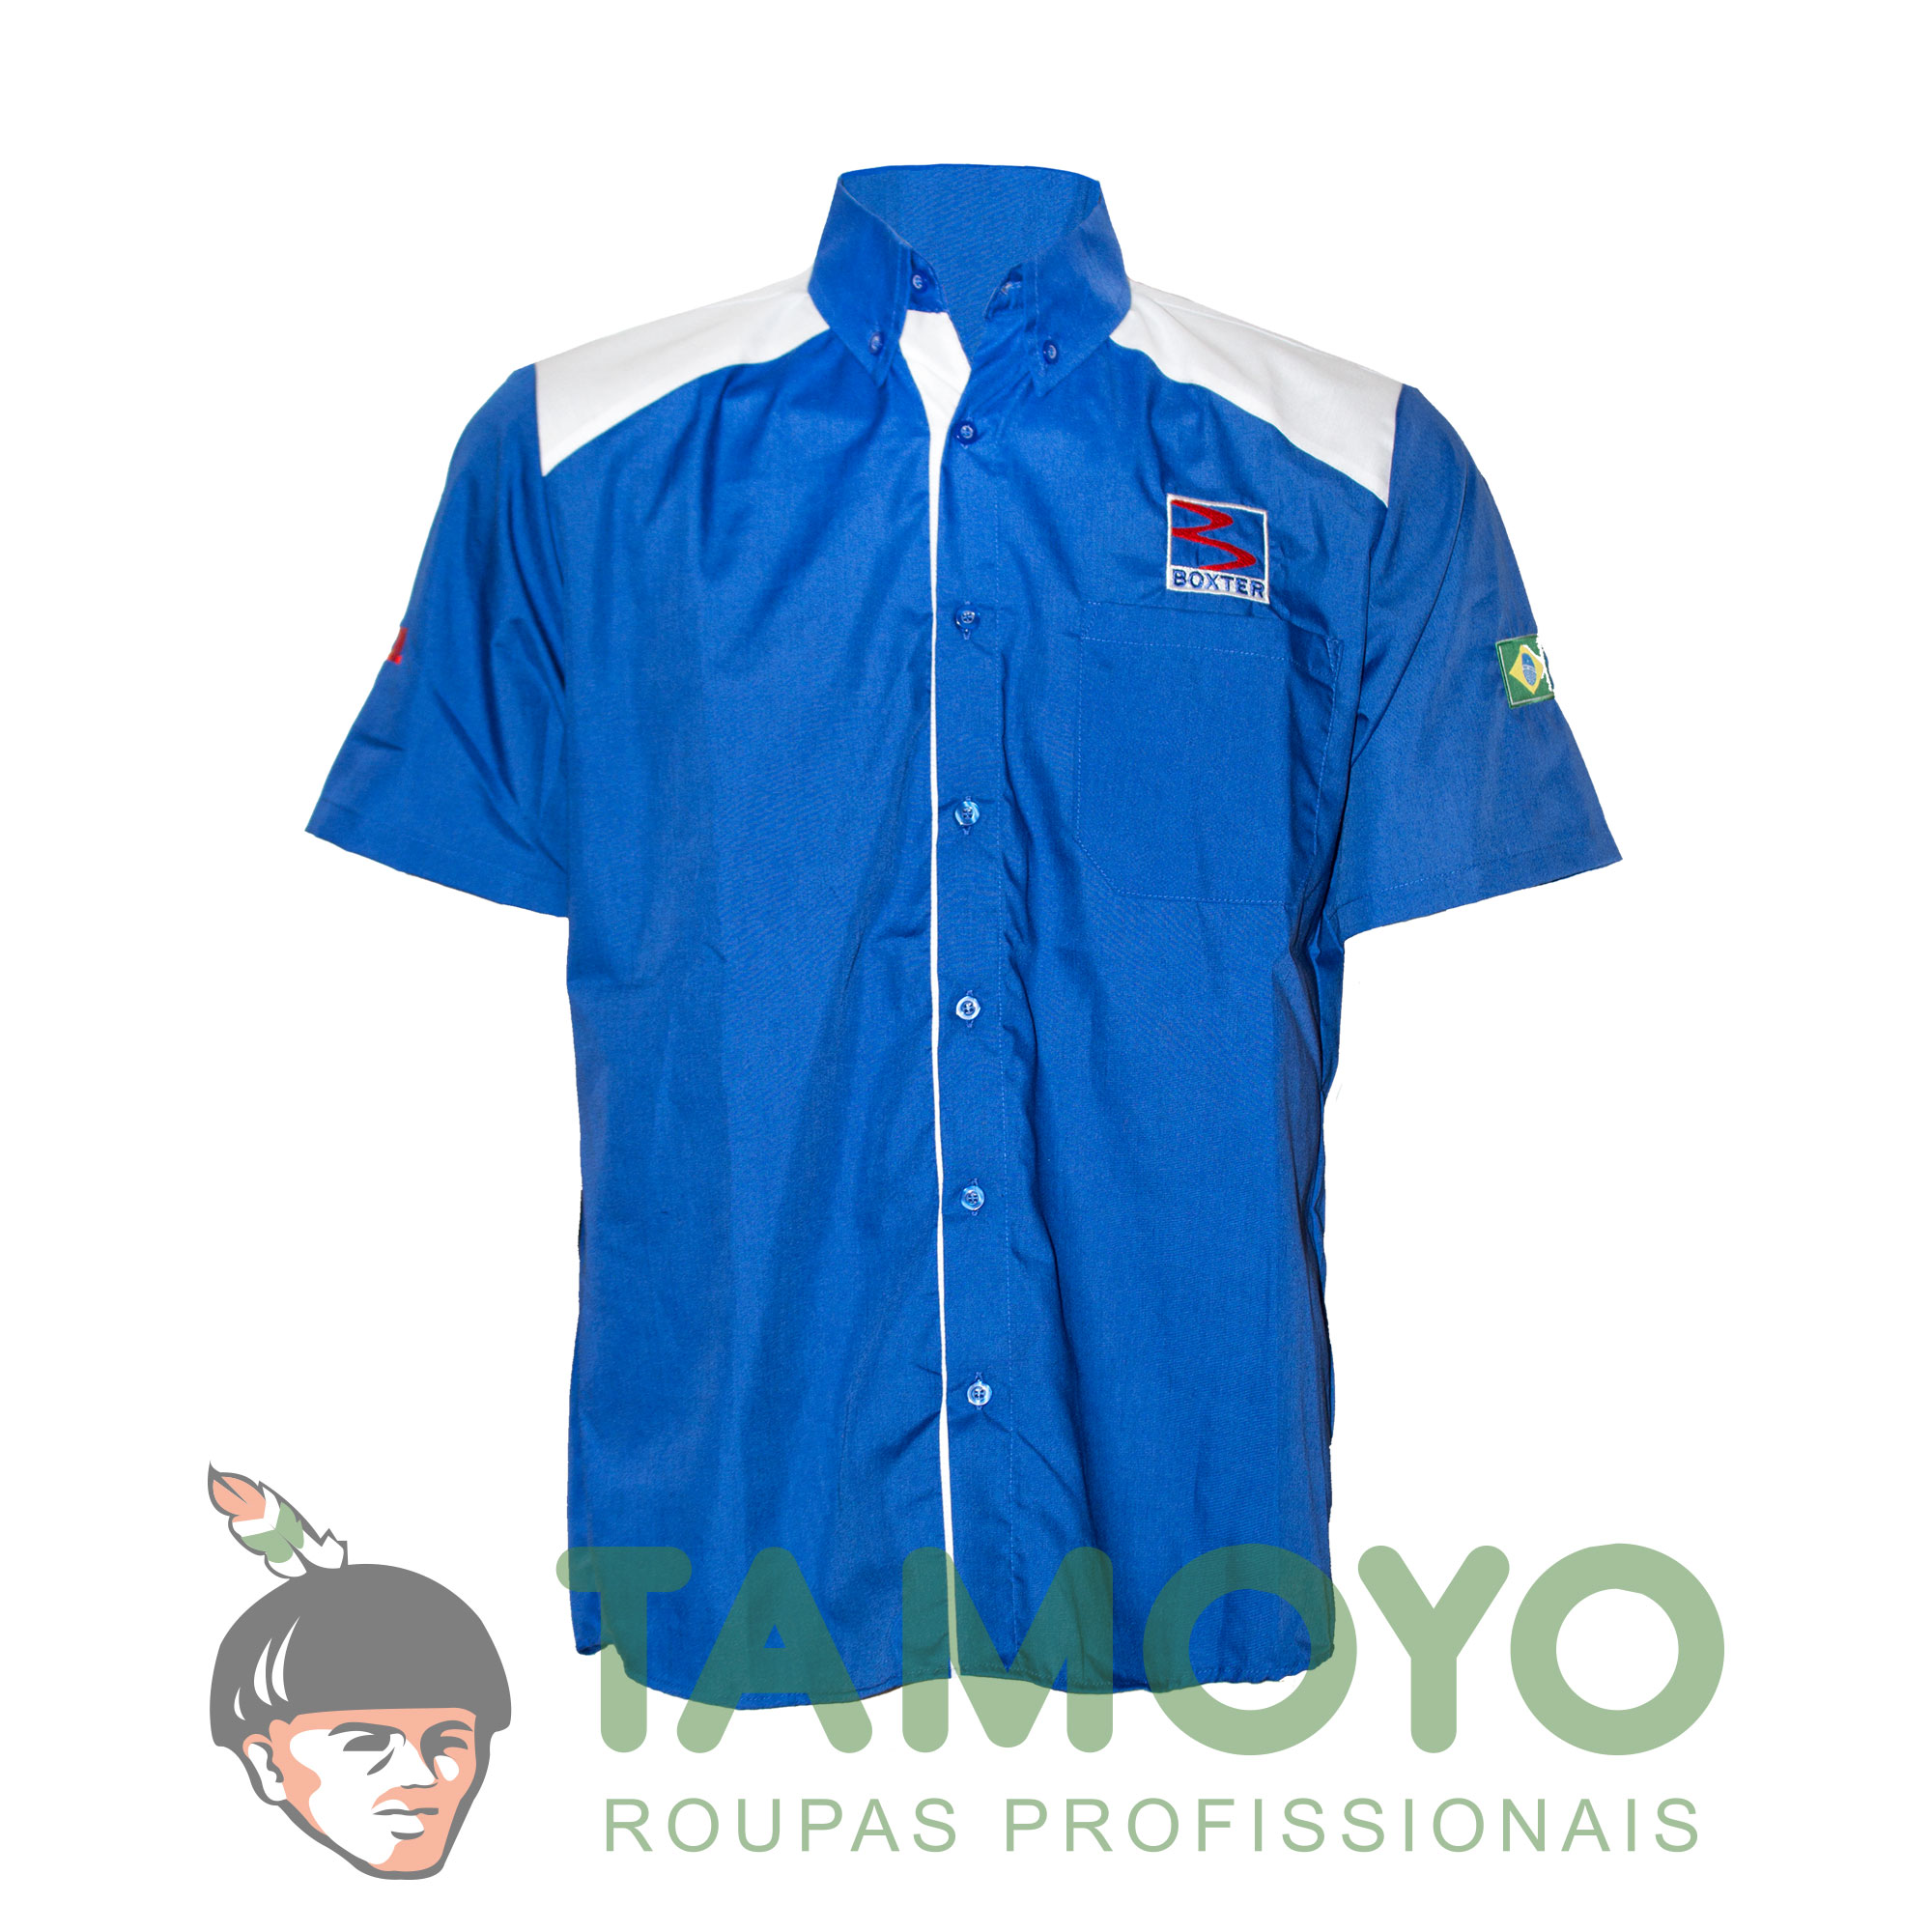 camisa-social-chefe-de-pista-masculino-roupas-tamoyo-uniformes-profissionais-f